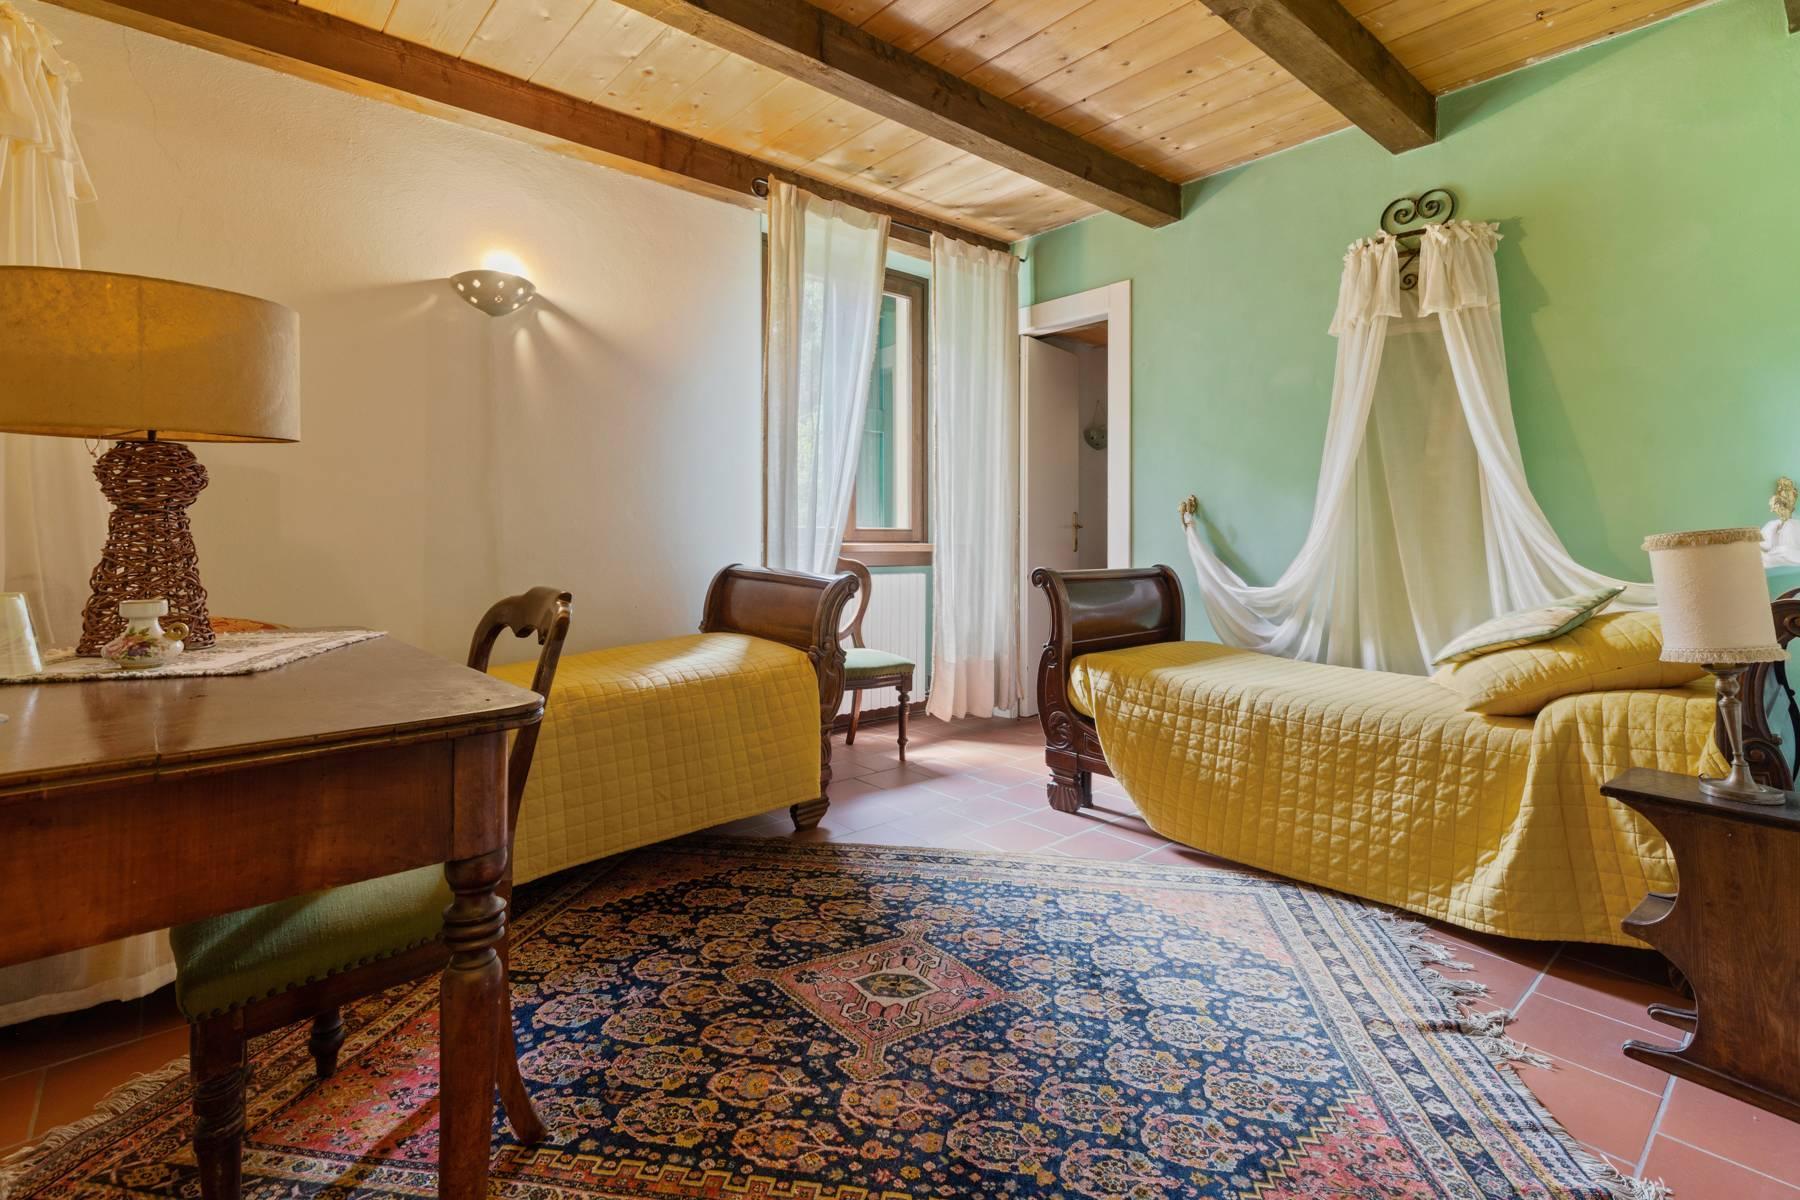 Affascinante villa Veneta a pochi minuti da Verona - 51